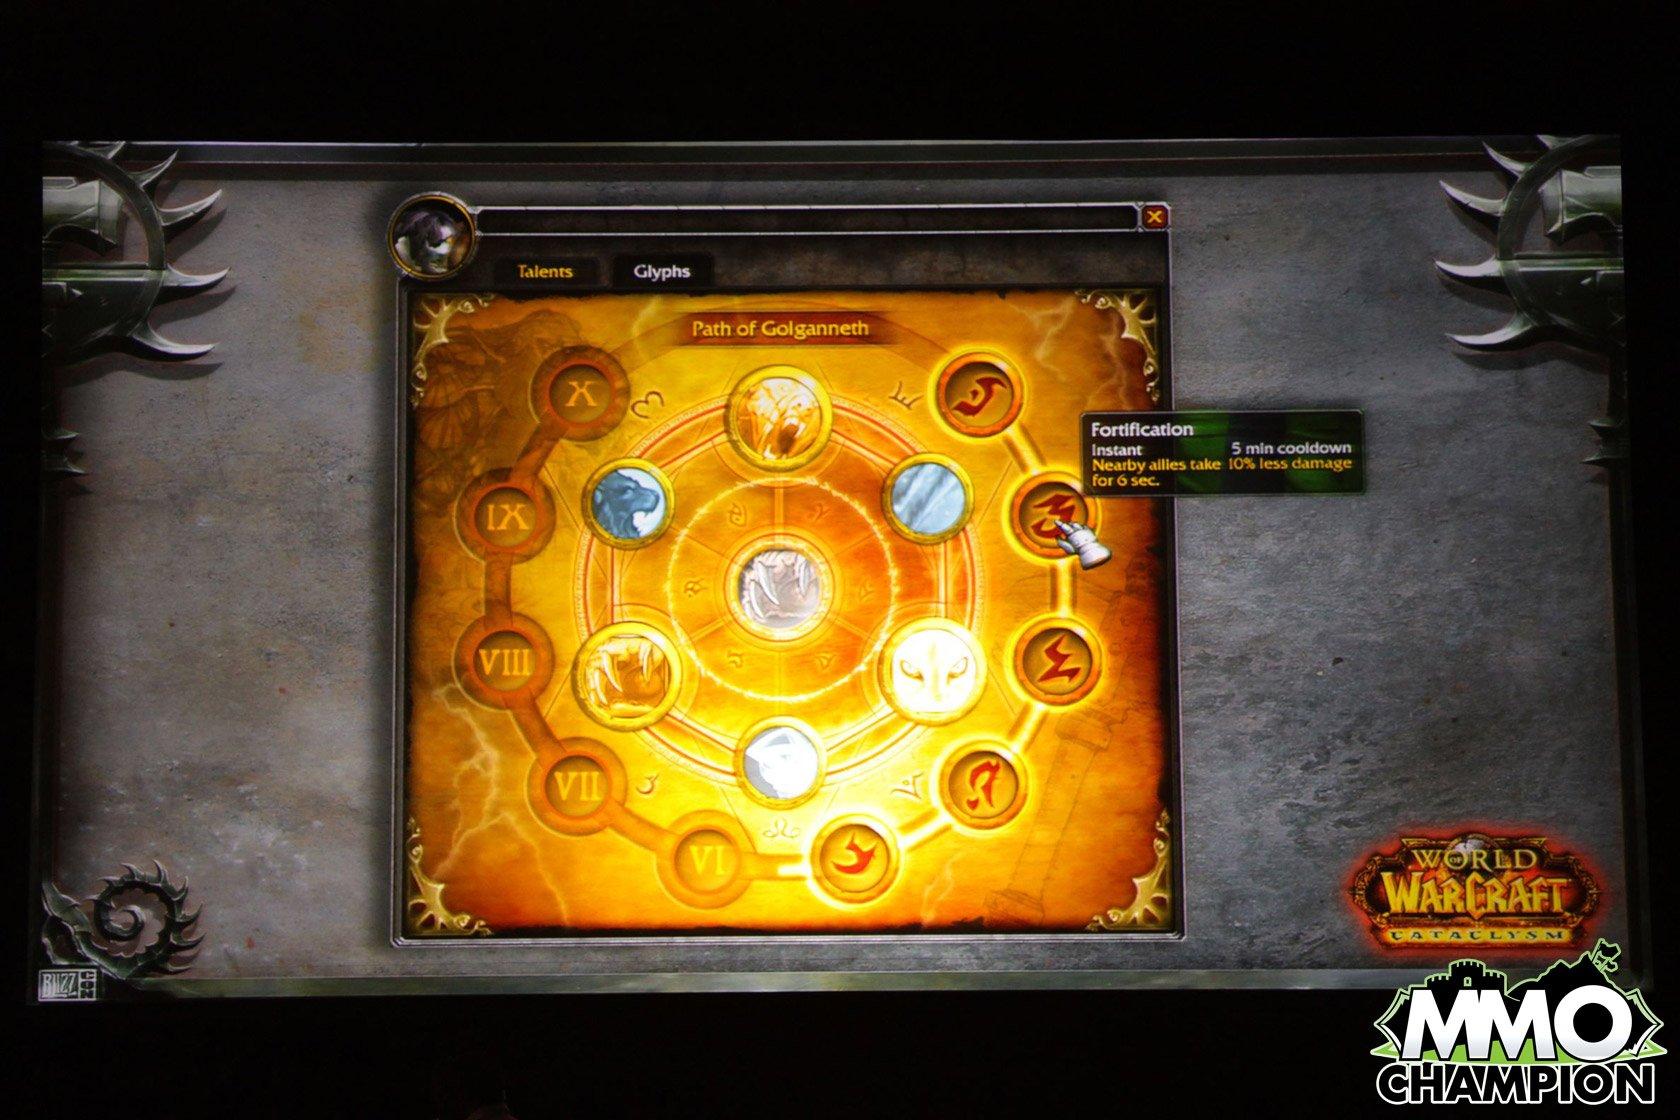 dernier jeux xbox 360 torrent